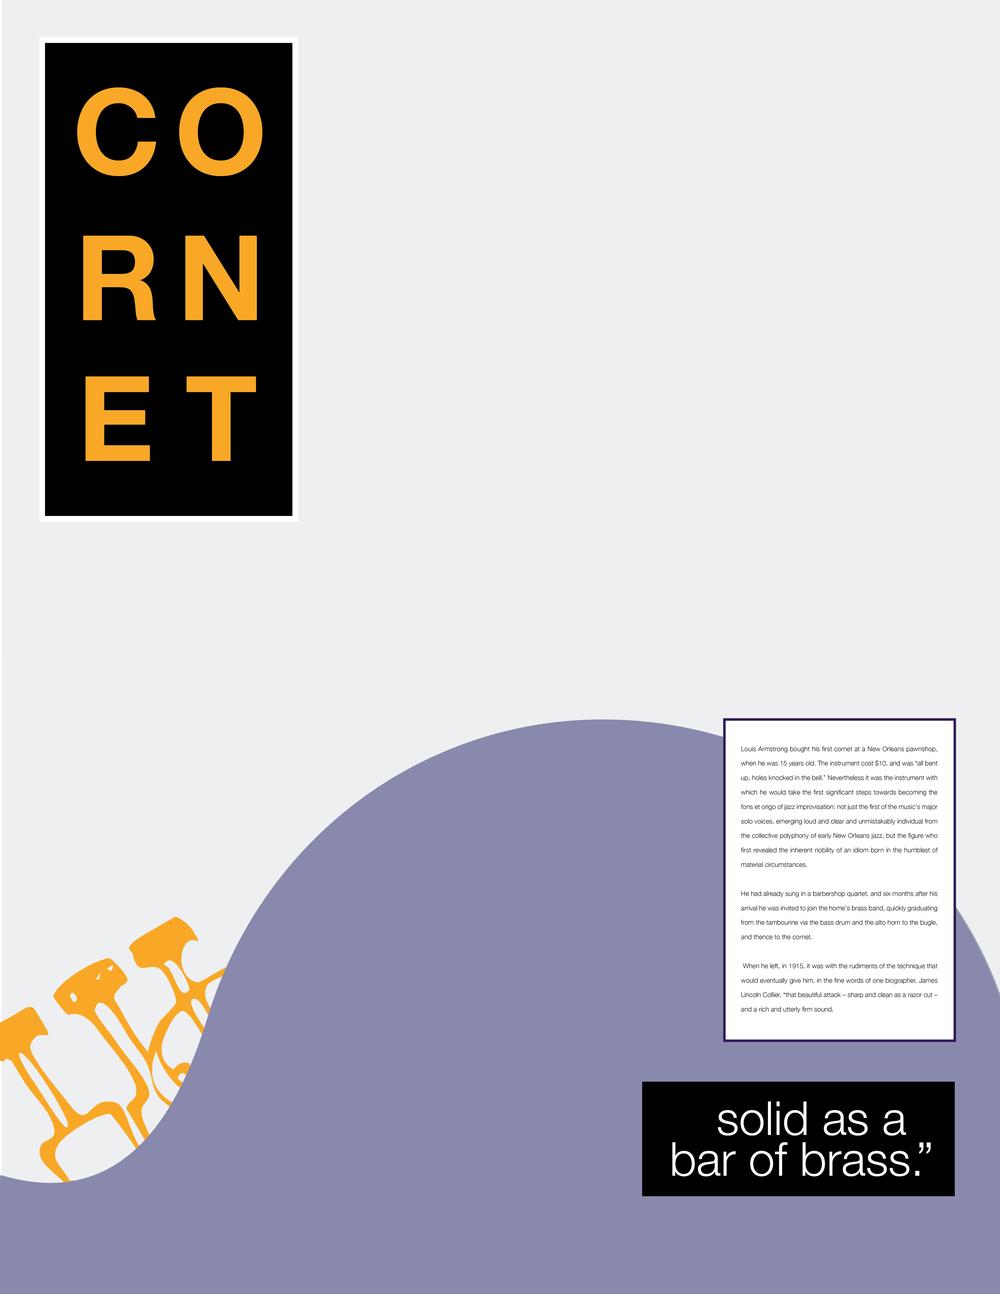 Cornet_Final_Contenders-02.png